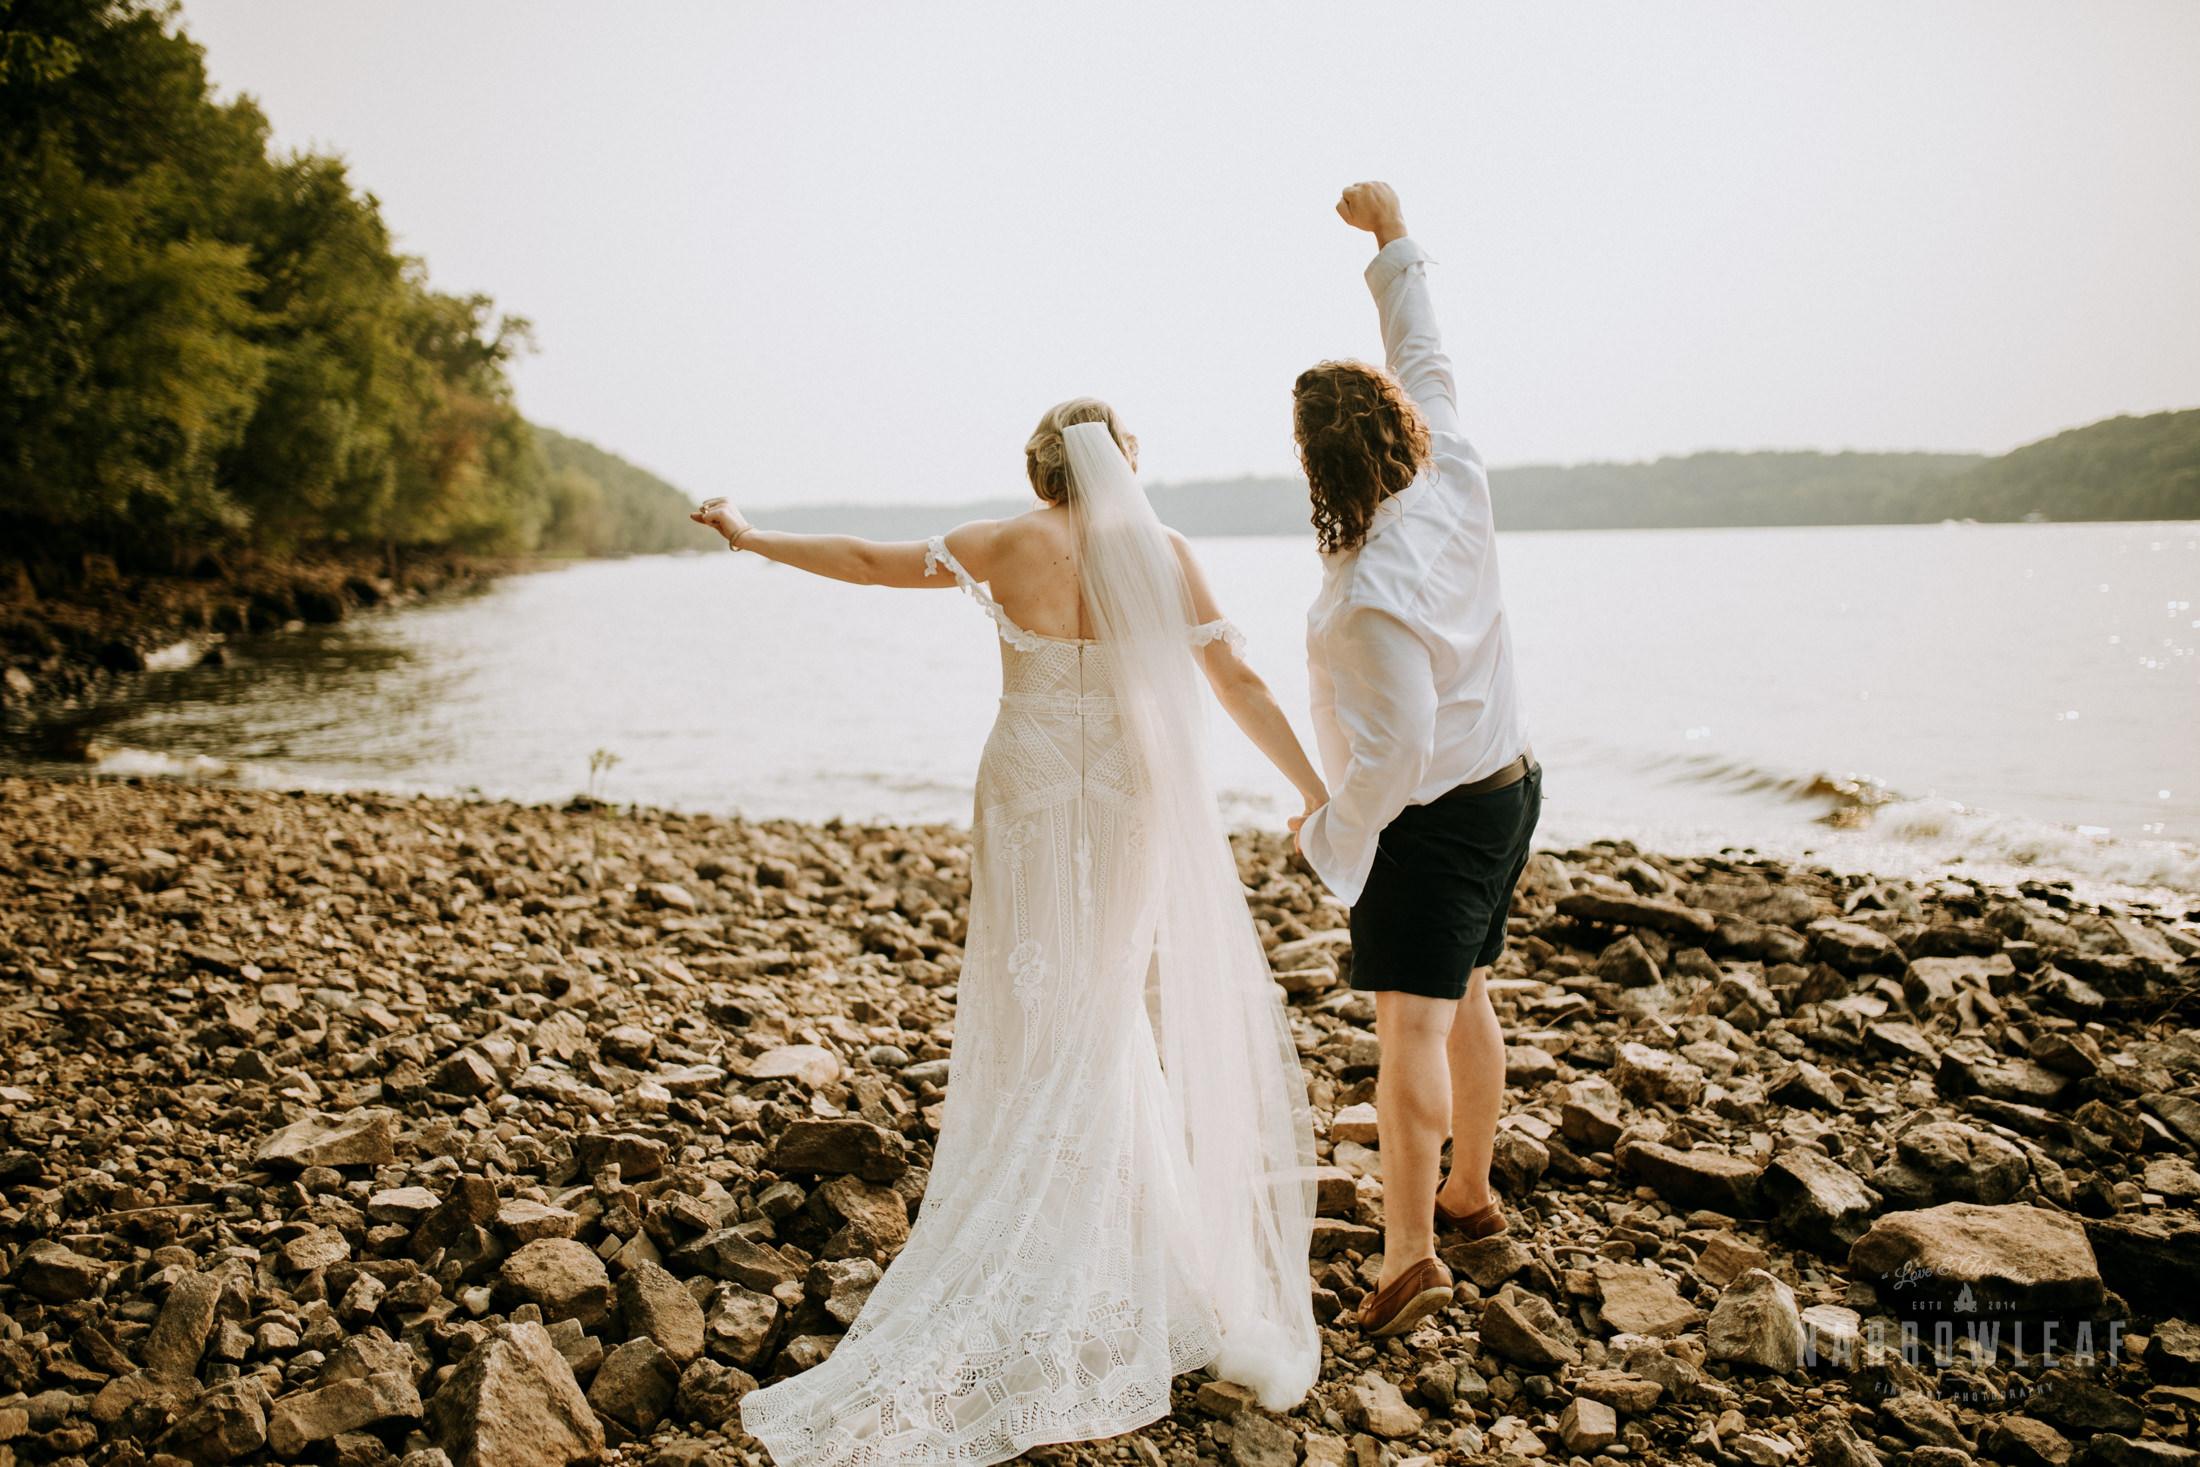 wisconsin-wedding-photographer-Narrowleaf_Love_and_Adventure_Photography-3166.jpg